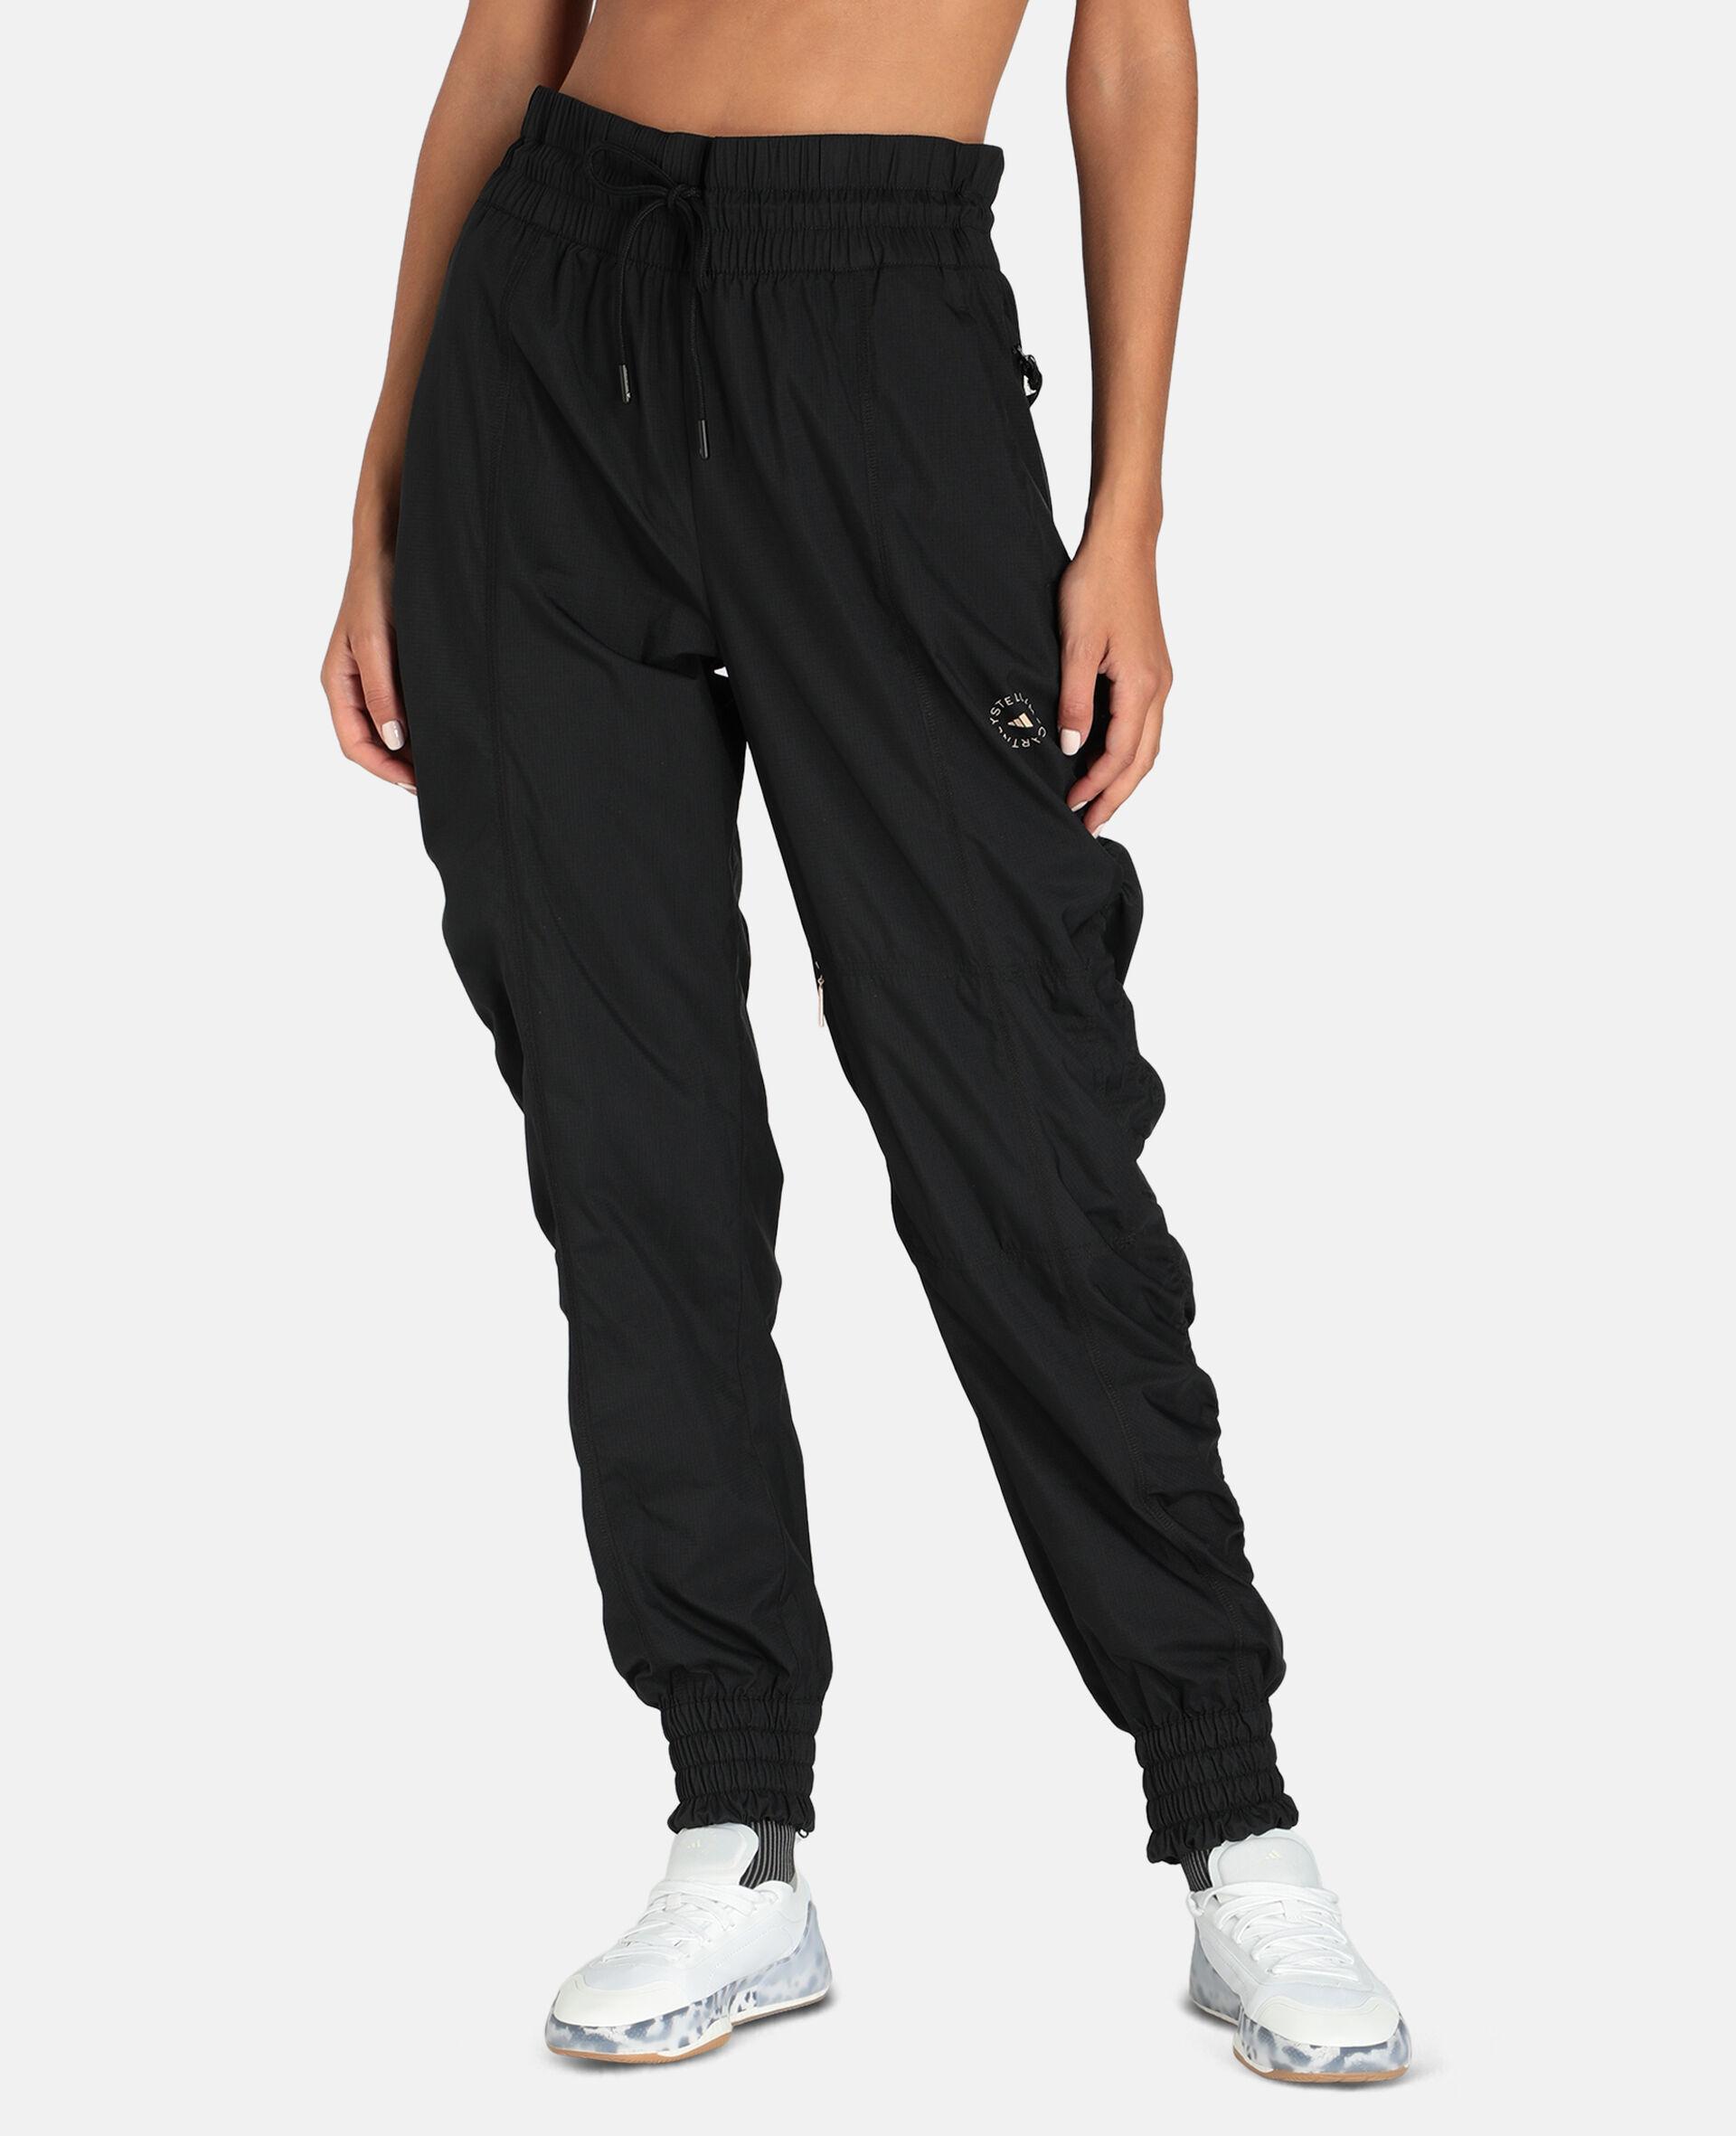 Black Woven Training Pants-Black-large image number 4